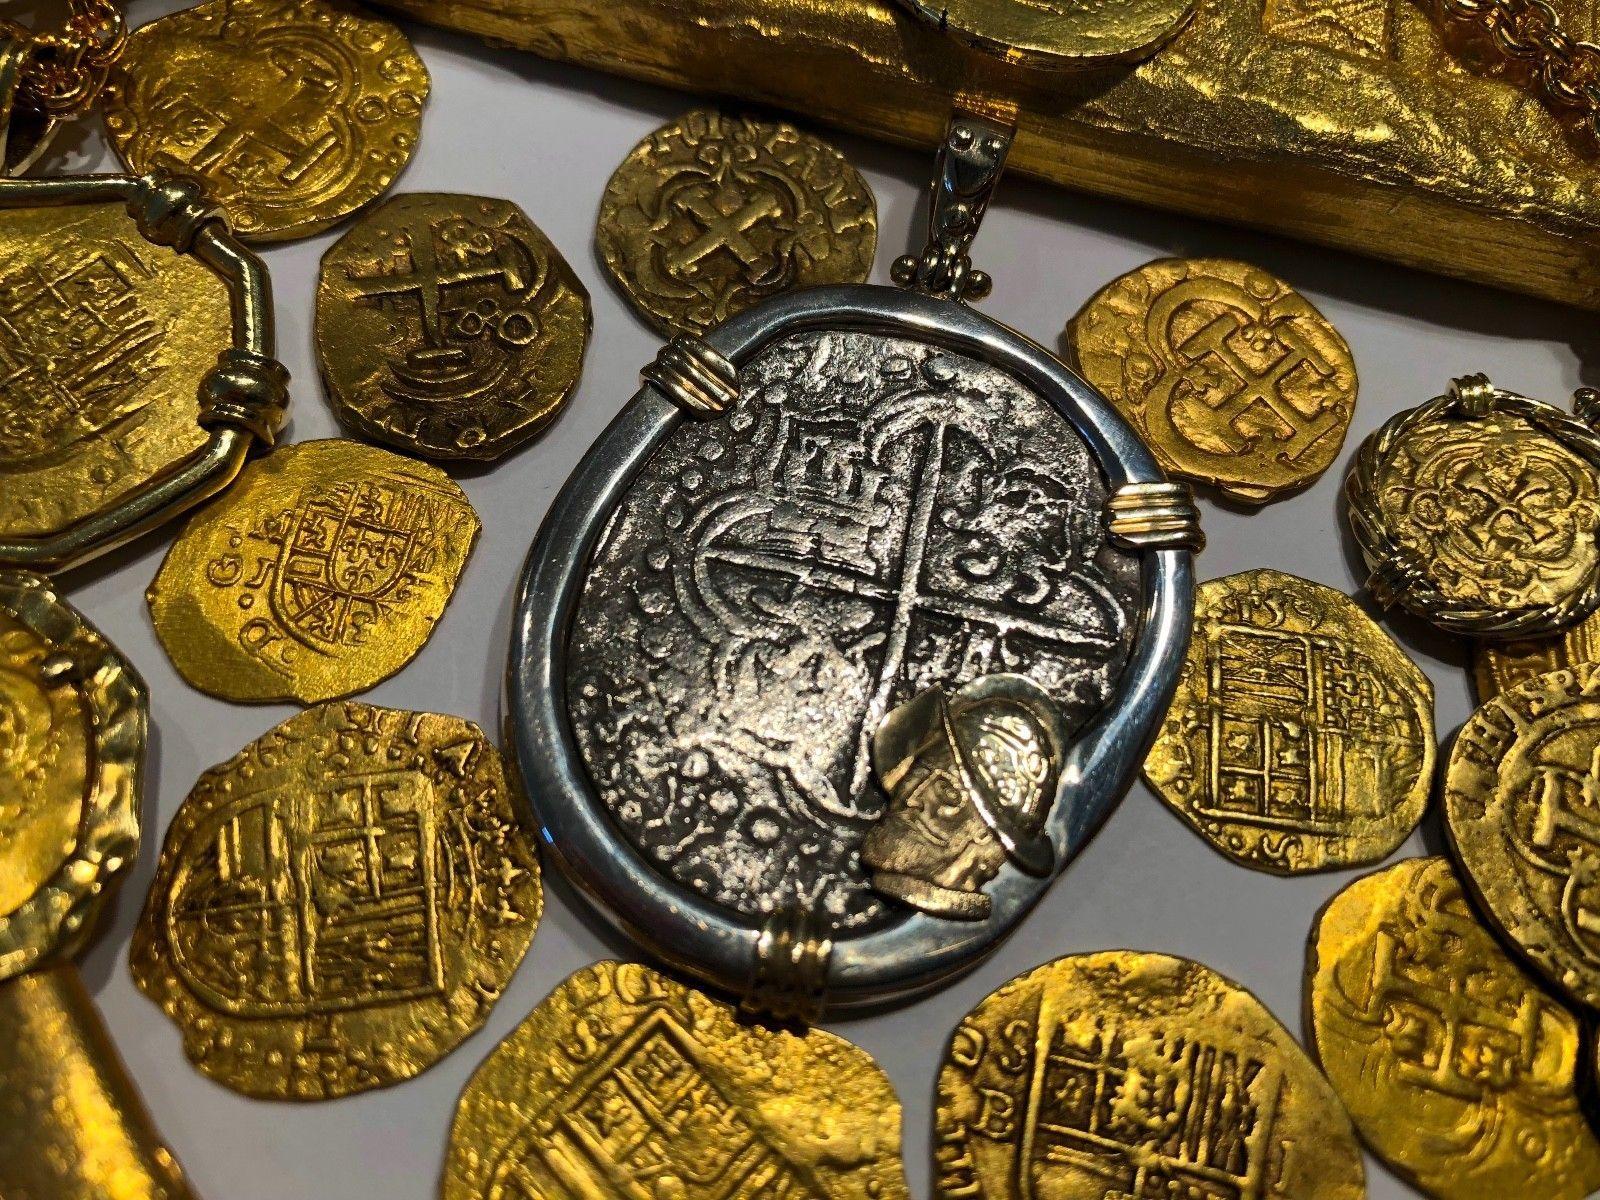 "ATOCHA NECKLACE 1619 BOLIVIA ""MEL FISHER COA"" PIRATE GOLD TREASRUE COIN JEWELERY"